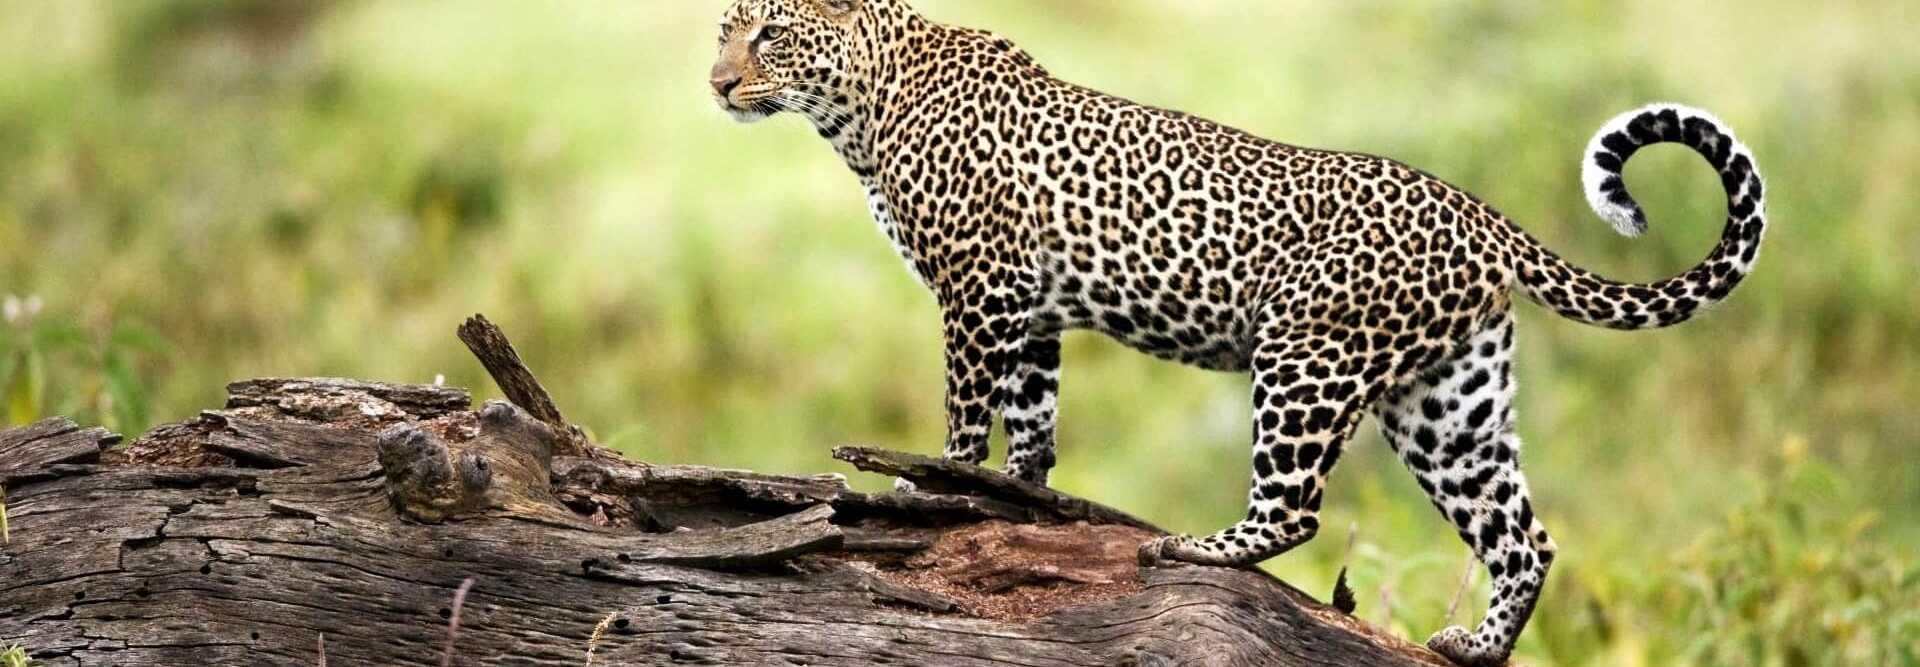 National Parks / Wild life / Flora and Fauna